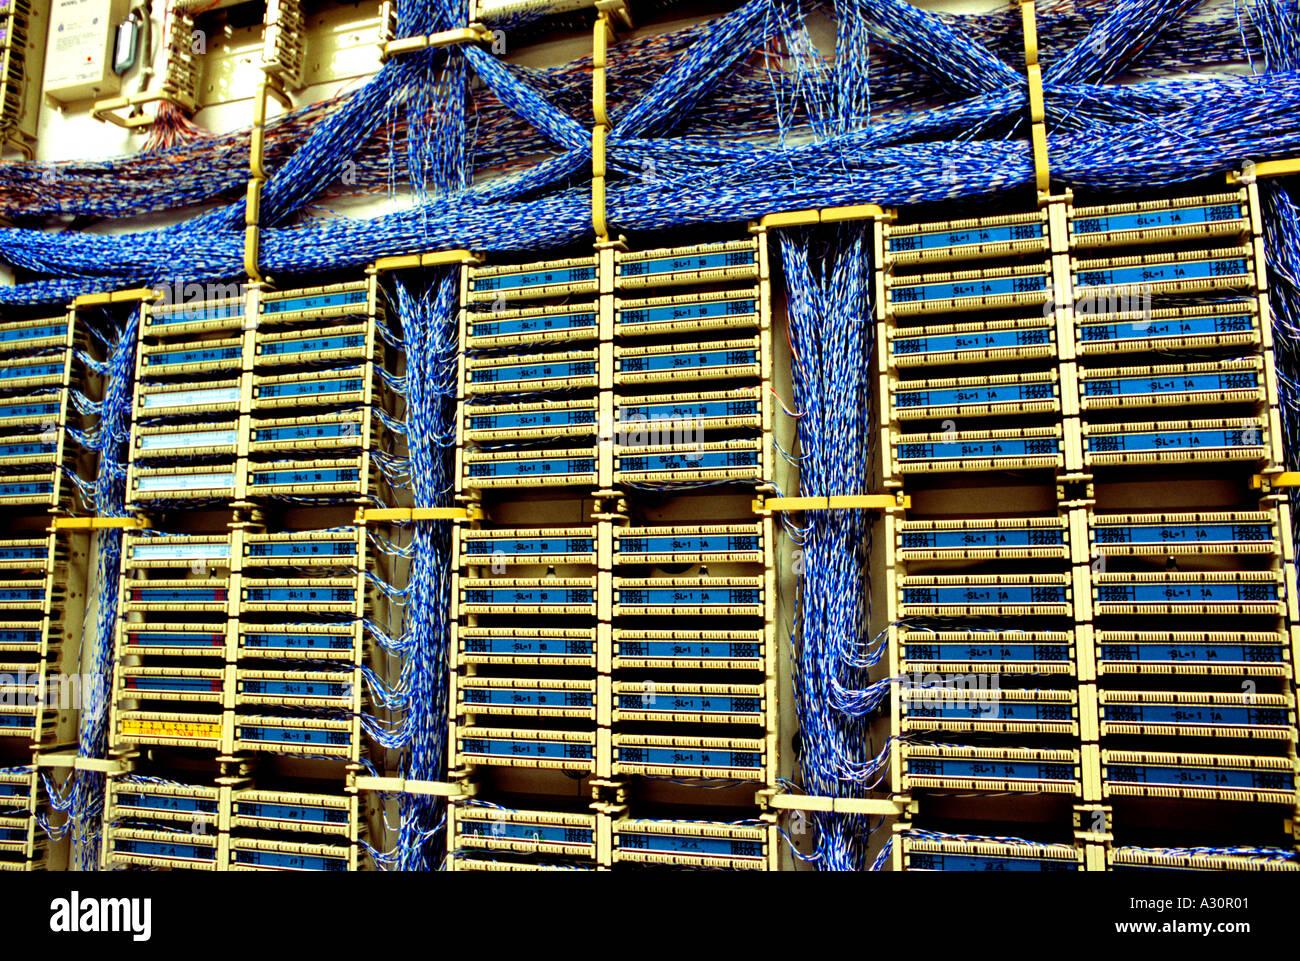 Hauptverteiler Stockfoto, Bild: 3471104 - Alamy